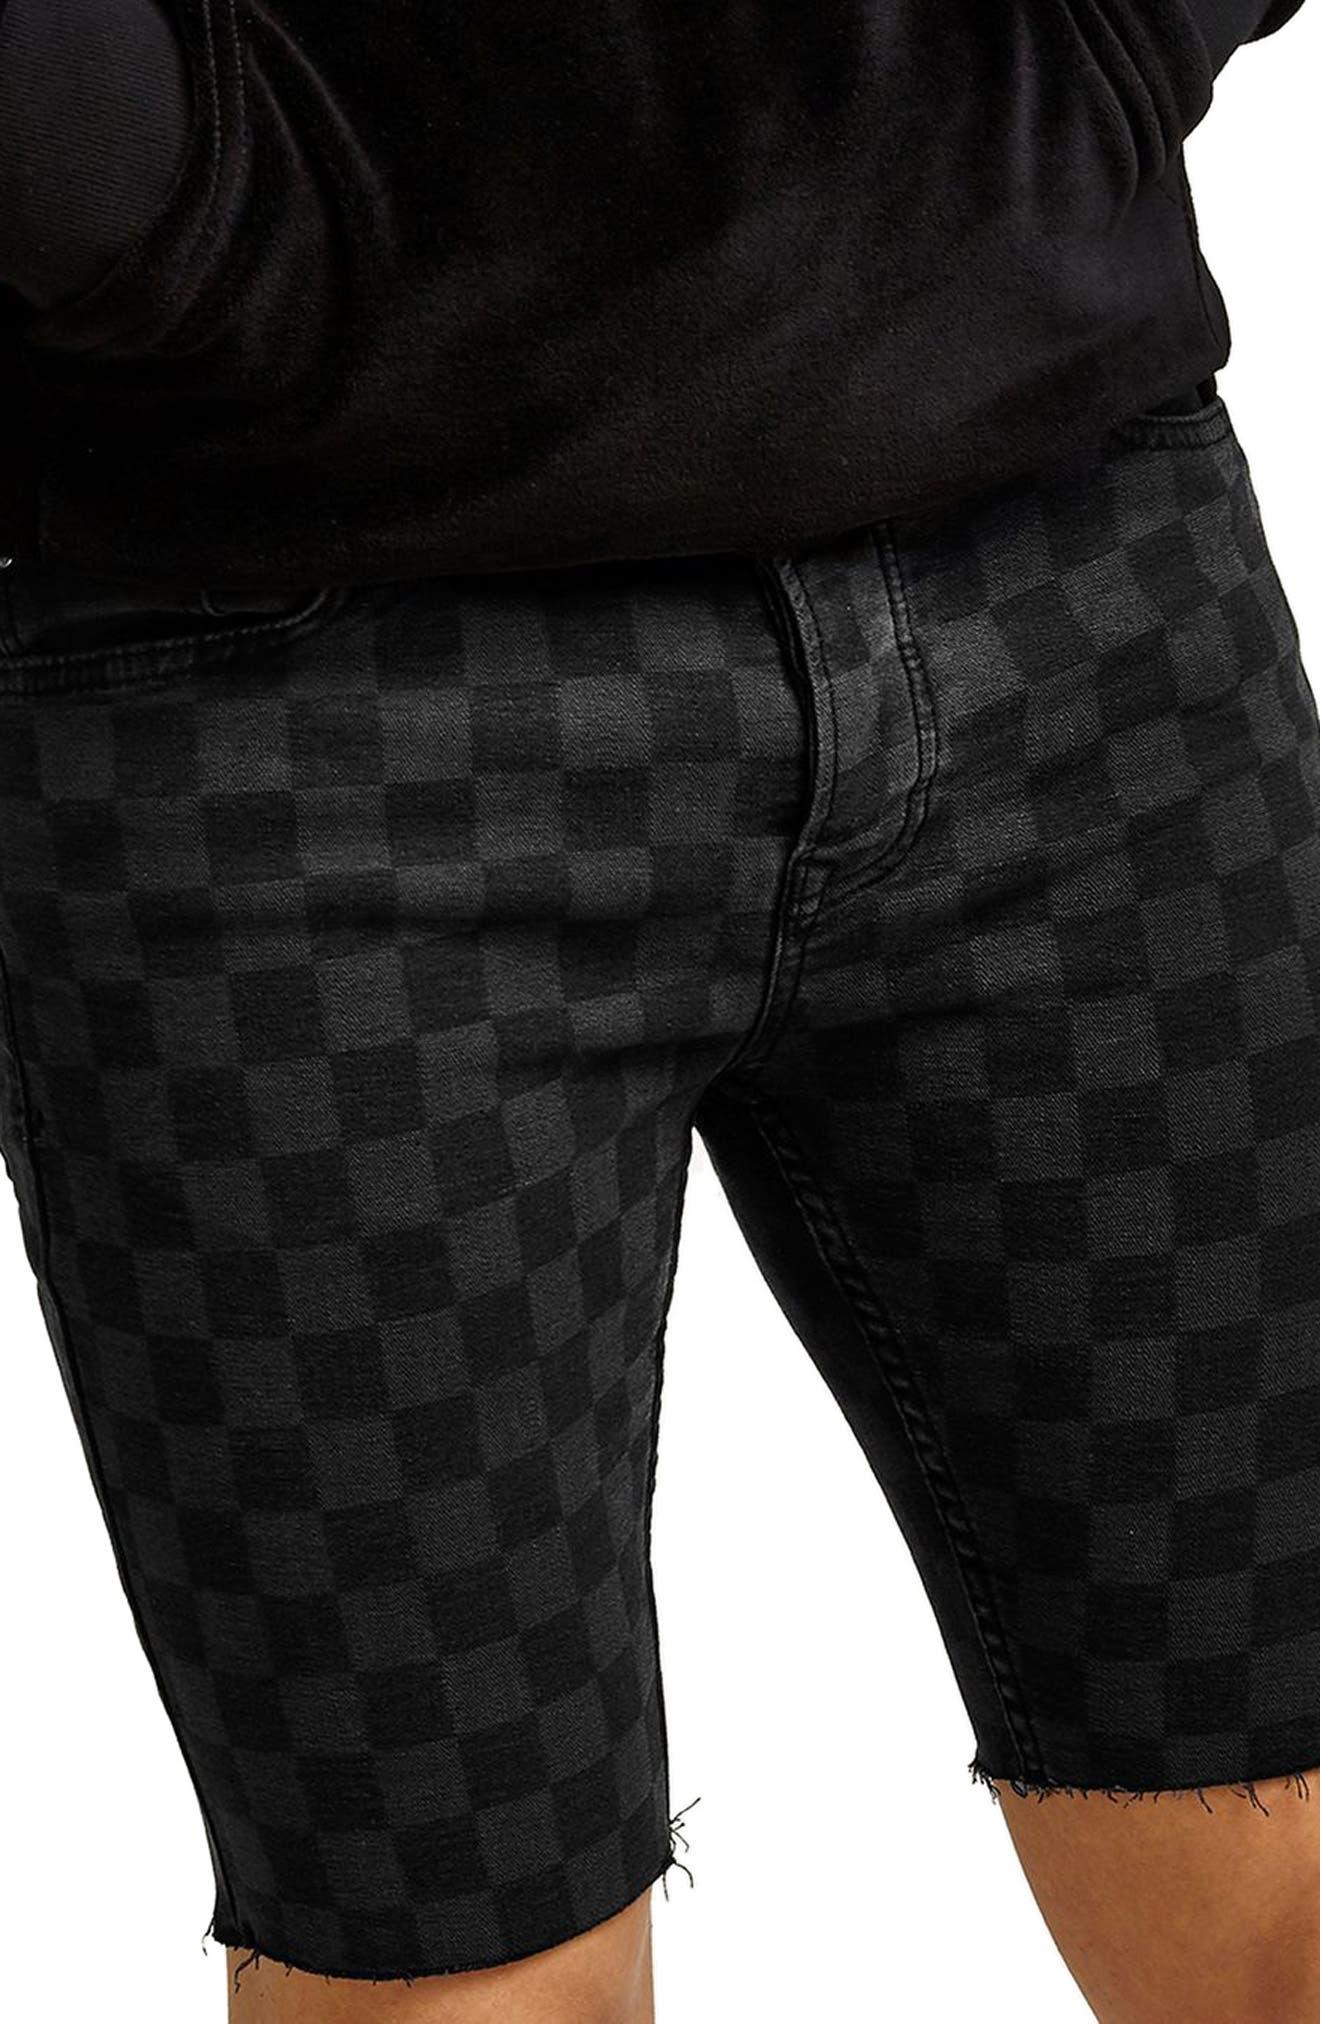 Stretch Skinny Fit Check Denim Shorts,                             Main thumbnail 1, color,                             001